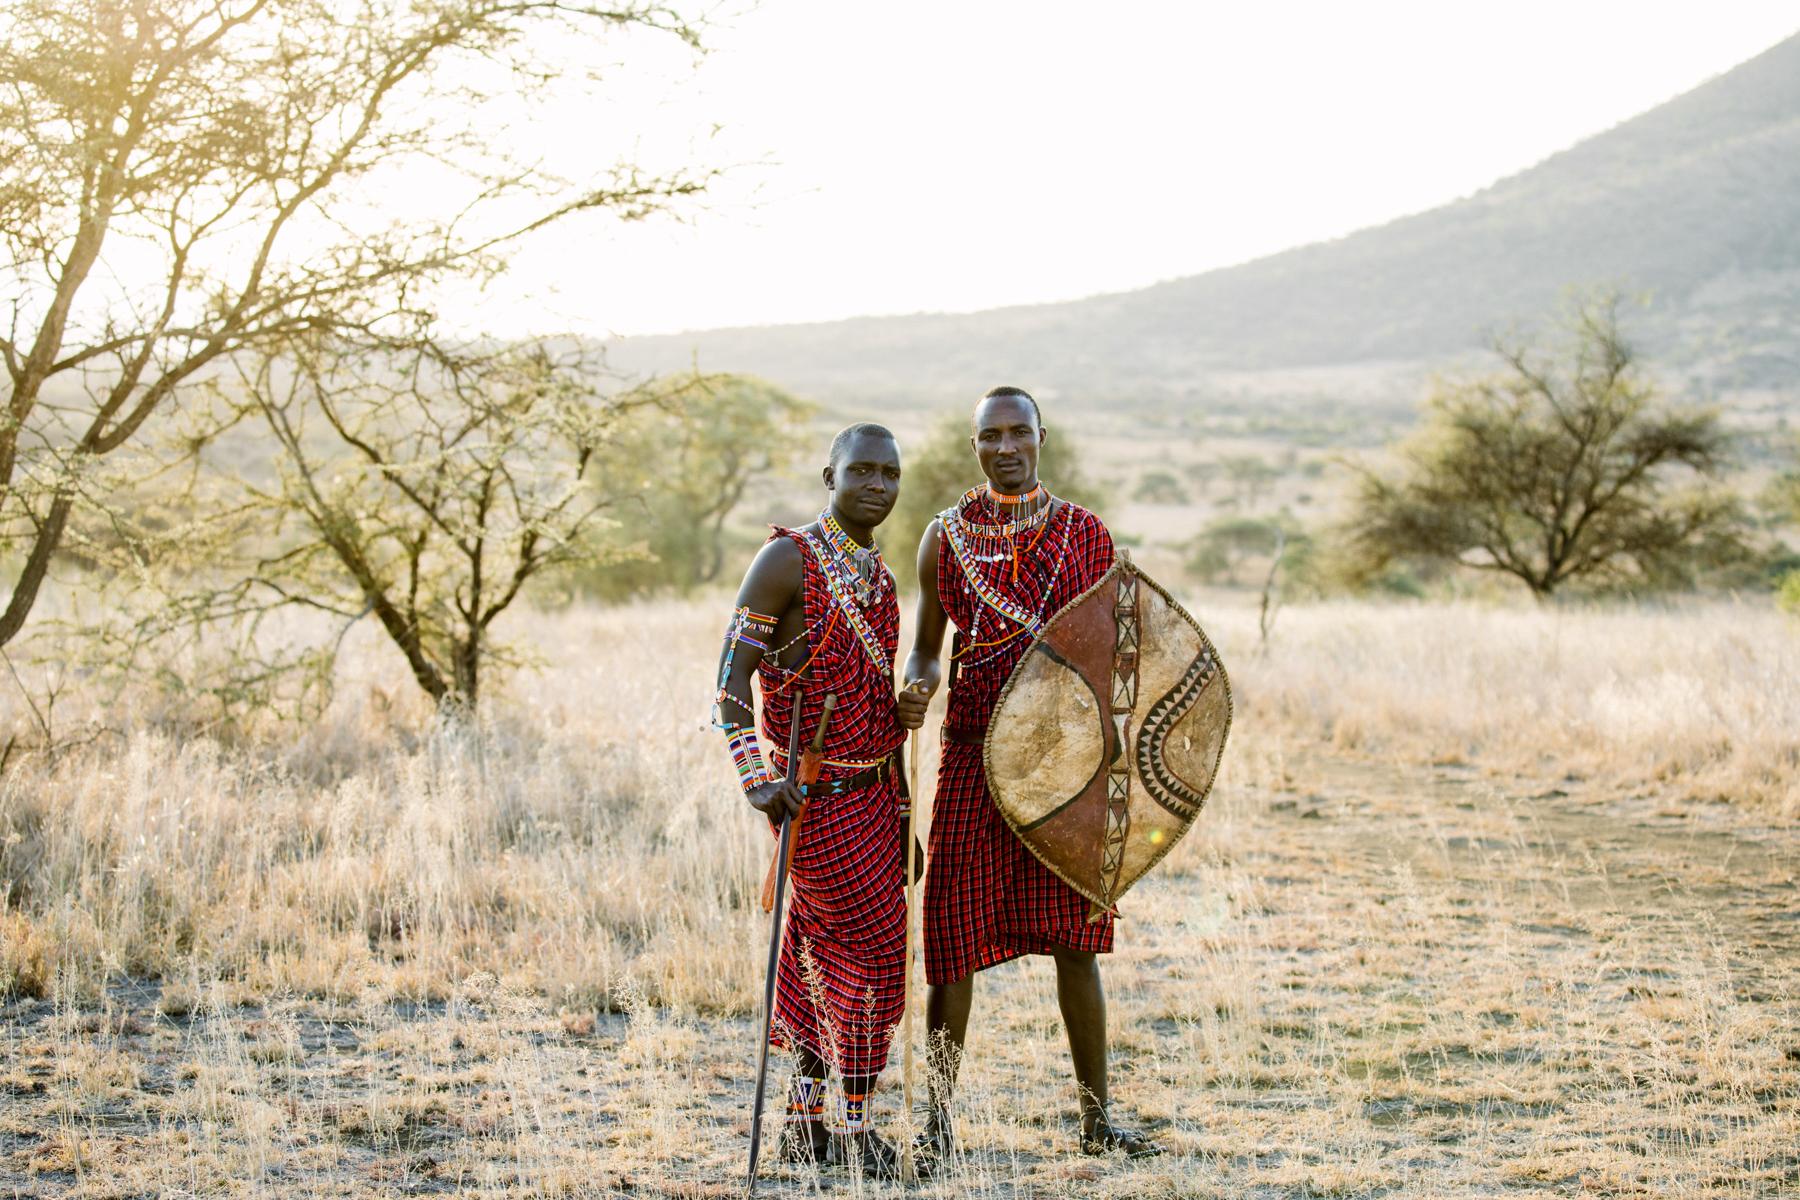 KenyaFeb2019_Safari-8.jpg